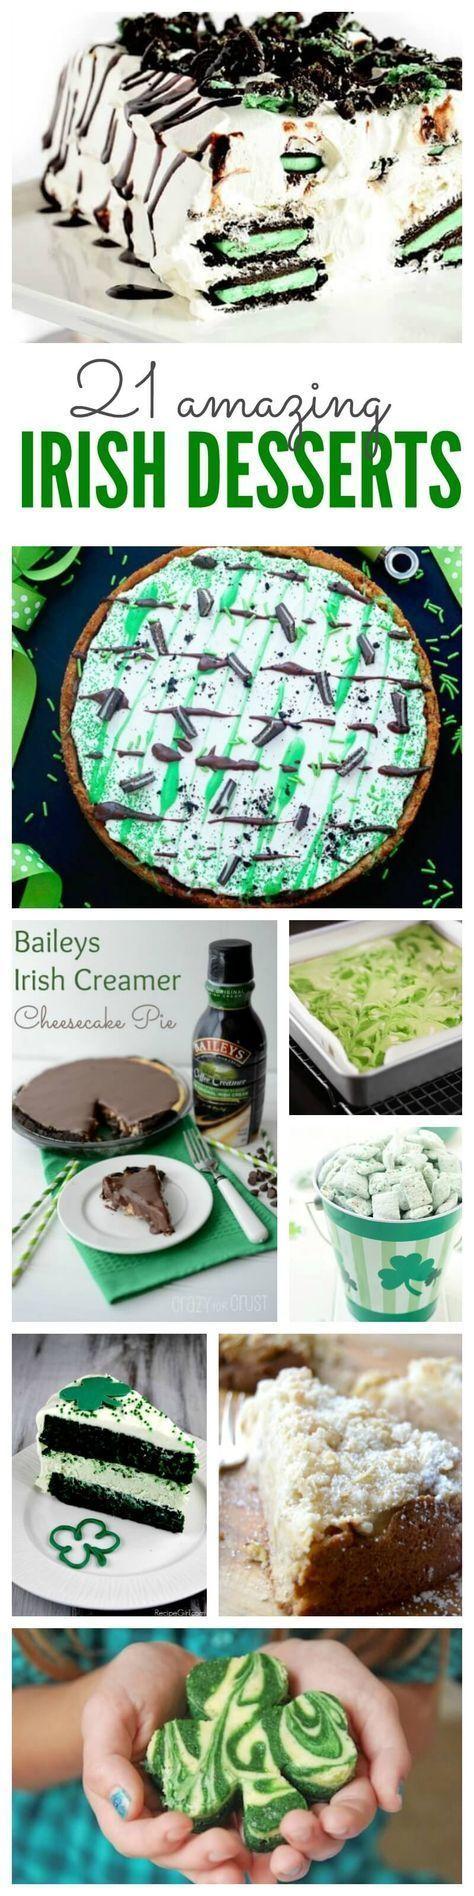 21 Amazing Irish Desserts! Homemade Recipe for St. Patrick's Day for Green Dessert Ideas!